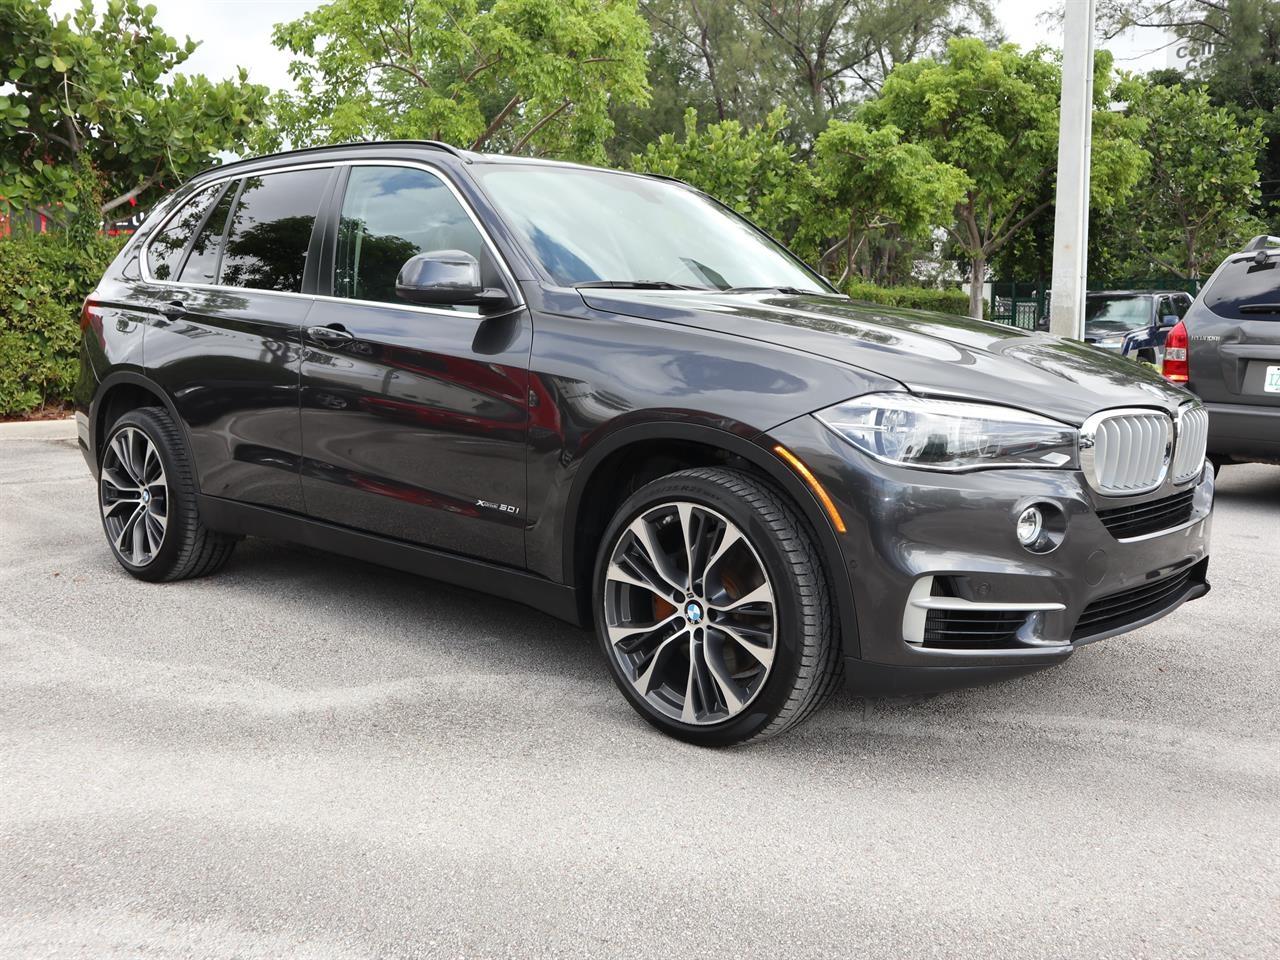 2014 BMW X5 AWD 4dr xDrive50i 5249 miles 2 Seatback Storage Pockets 4 12V DC Power Outlets LEATH